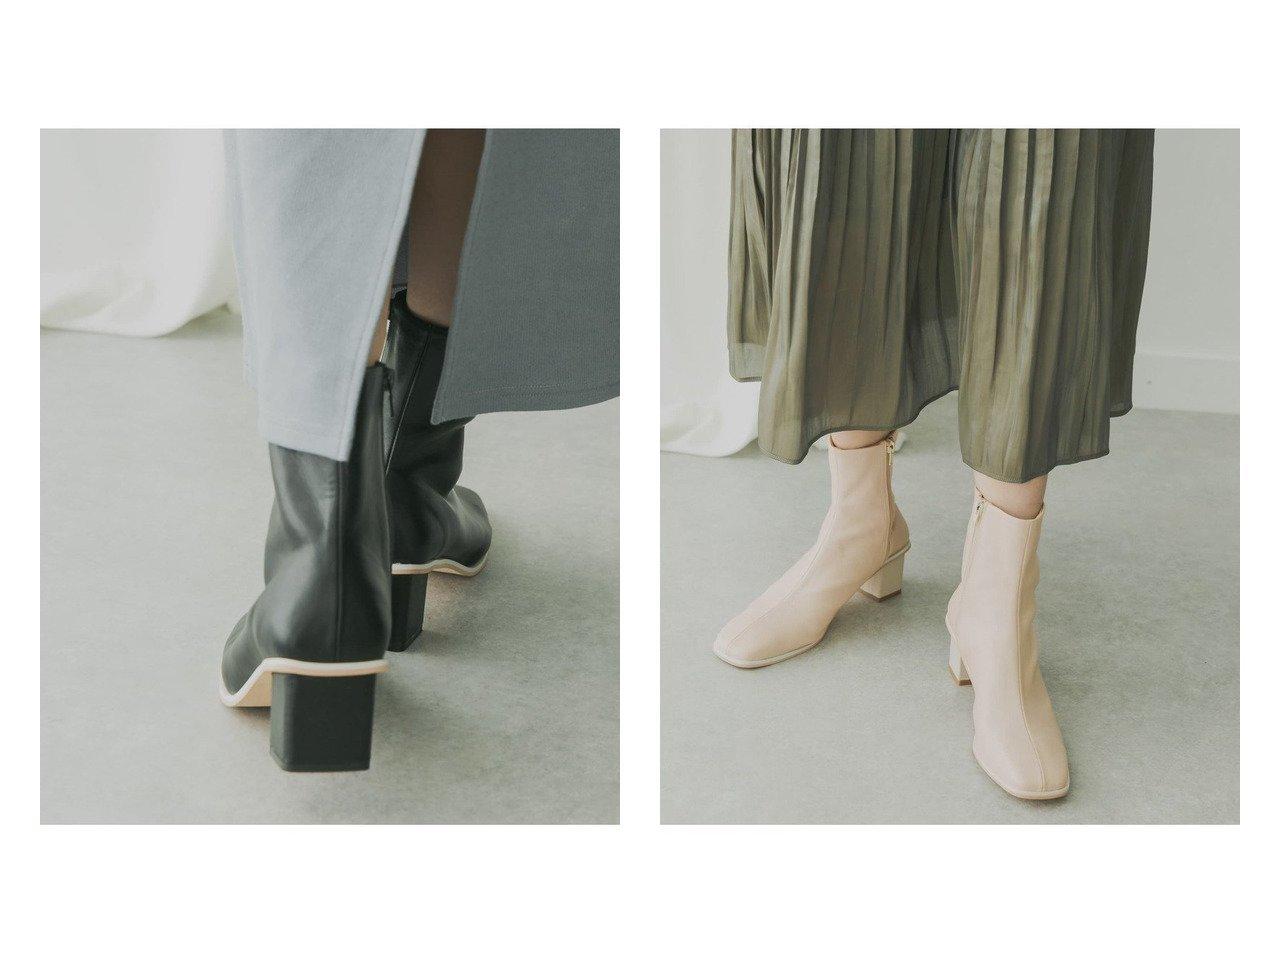 【KBF / URBAN RESEARCH/ケービーエフ】のKBF+ スクエアトゥストレッチブーツ シューズ・靴のおすすめ!人気、トレンド・レディースファッションの通販 おすすめで人気の流行・トレンド、ファッションの通販商品 メンズファッション・キッズファッション・インテリア・家具・レディースファッション・服の通販 founy(ファニー) https://founy.com/ ファッション Fashion レディースファッション WOMEN NEW・新作・新着・新入荷 New Arrivals シューズ ショート スクエア 春 Spring |ID:crp329100000011795